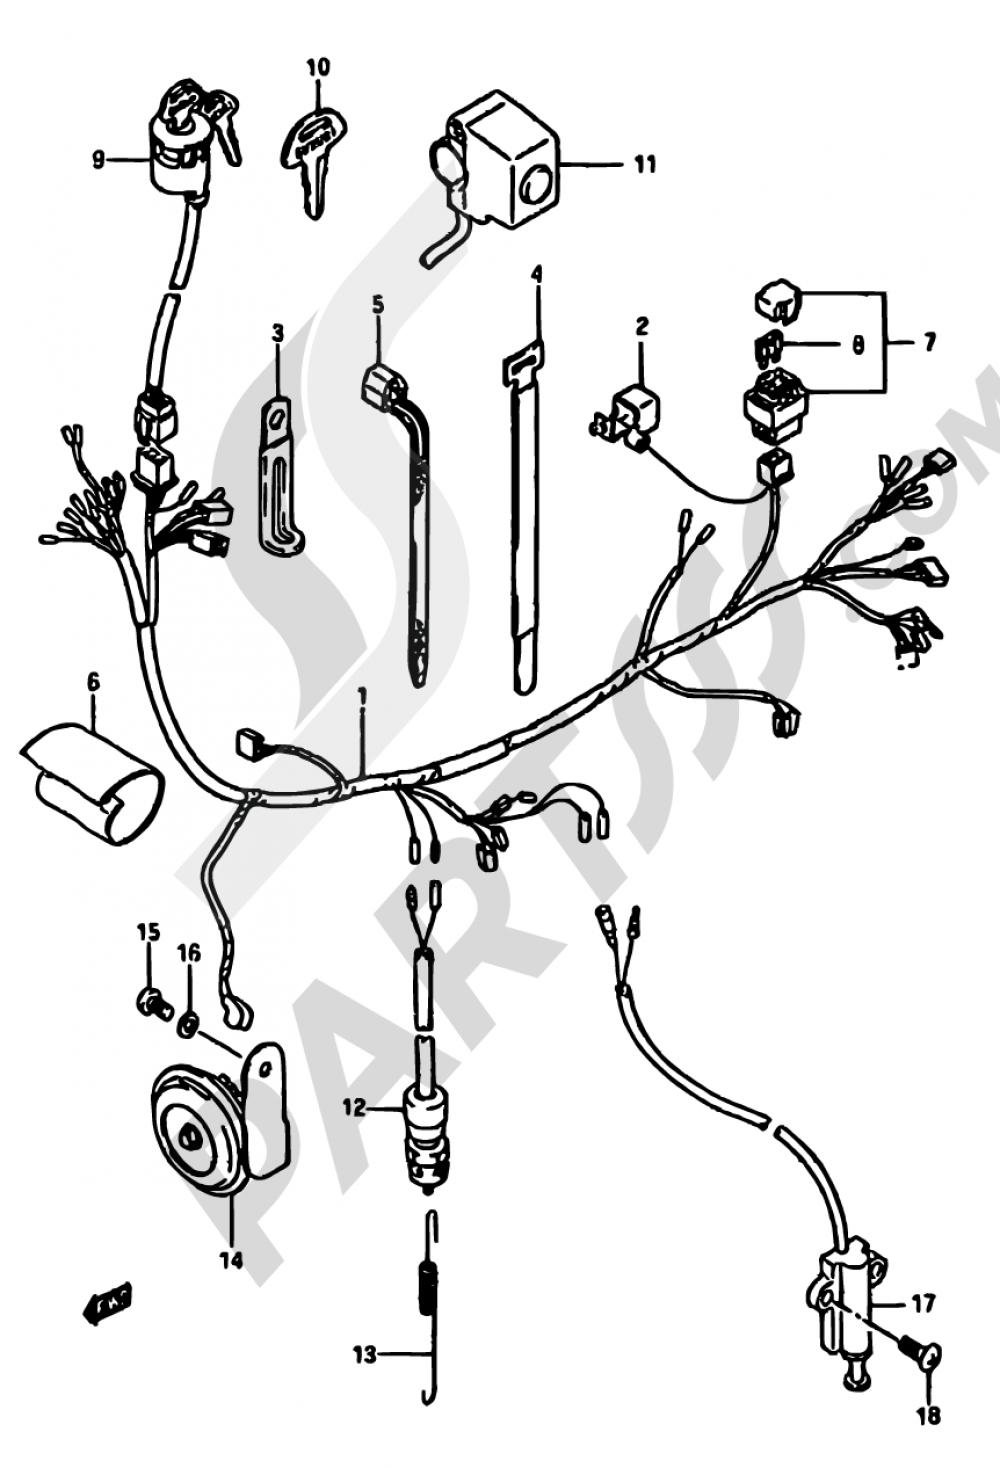 tlr200 wiring diagram fuse box wiring diagram Connect IDE to USB Cable Wiring Diagram tlr200 wiring diagram wiring diagramxr600r wiring diagram wiring diagram databasesuzuki dr 600 wiring diagram best wiring